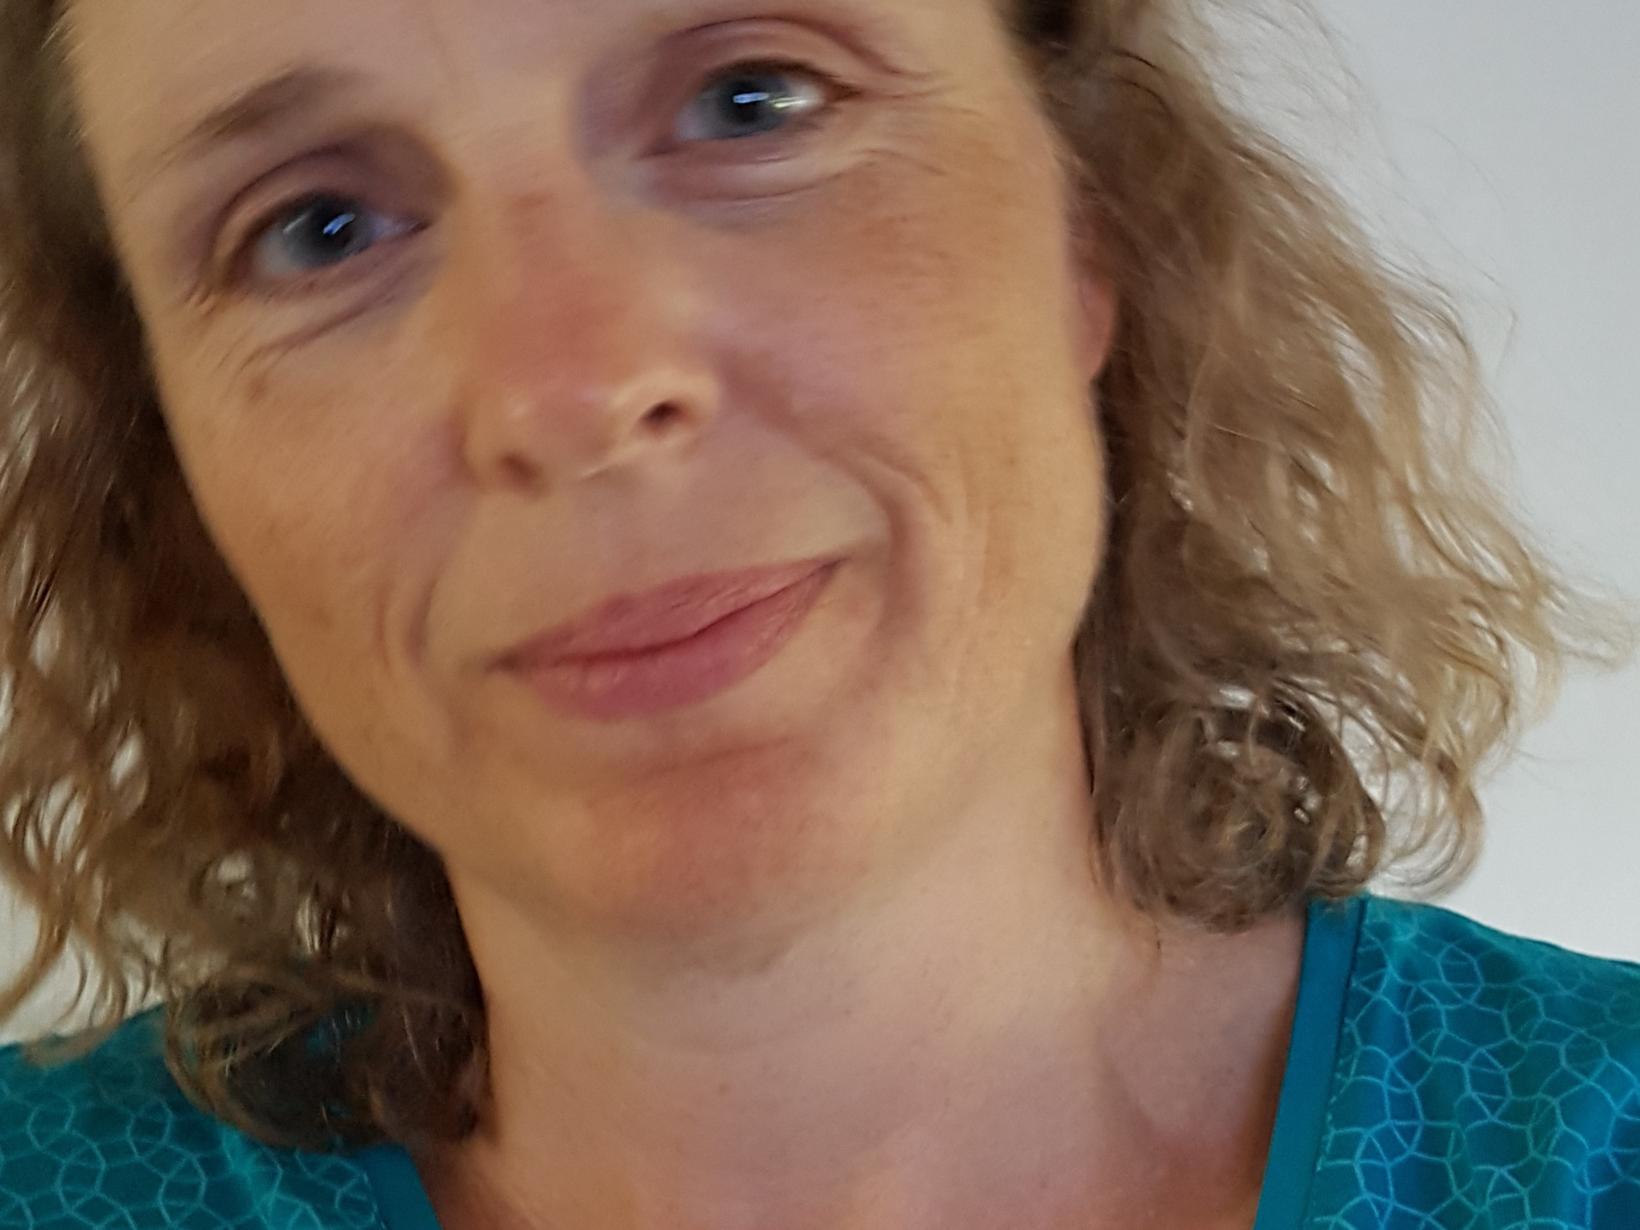 Monika from Braunau am Inn, Austria